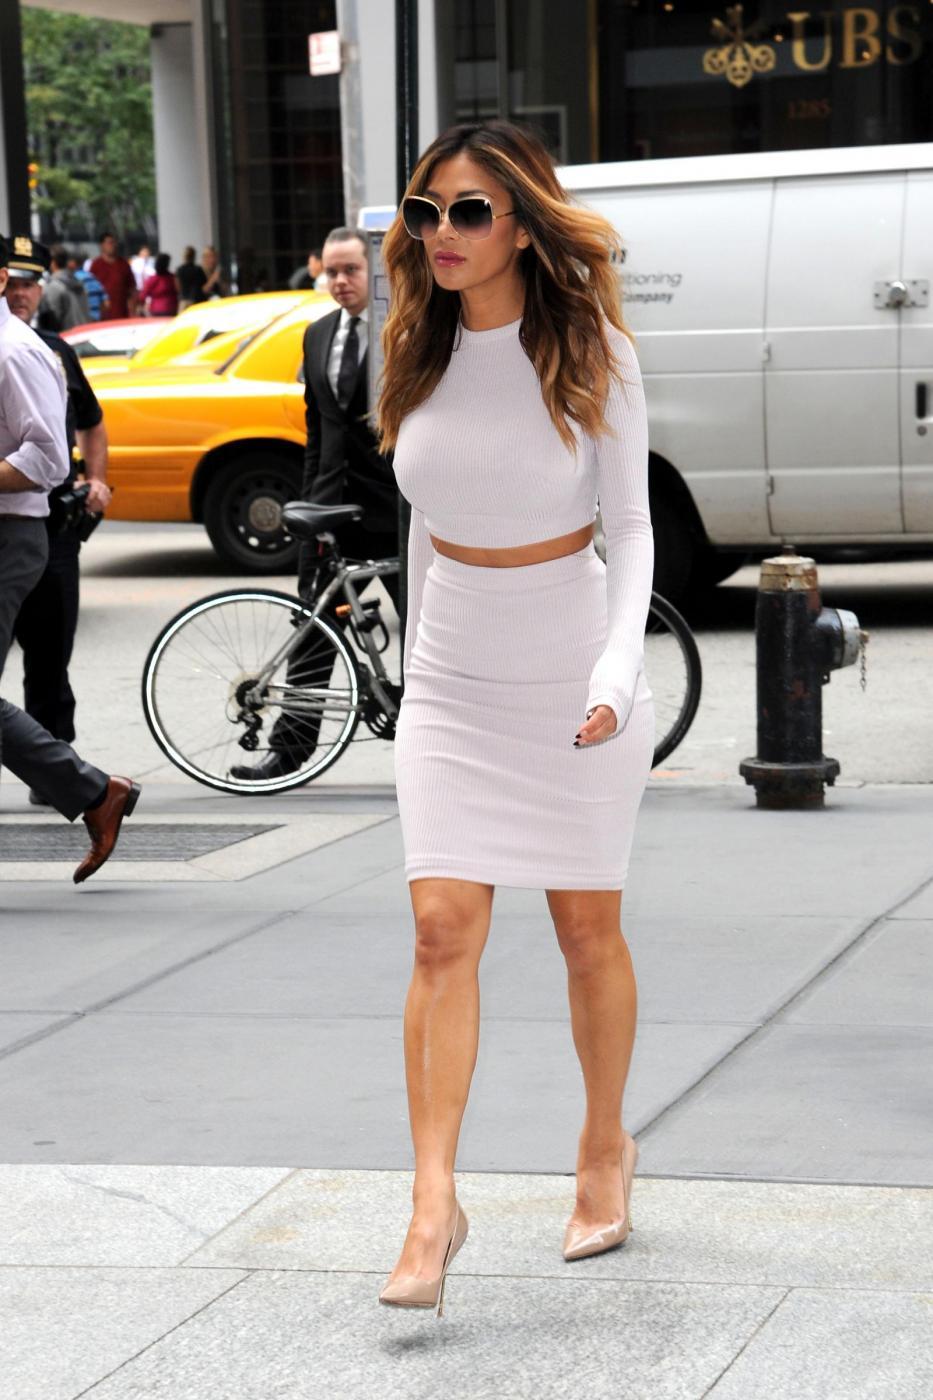 Nicole Scherzinger sempre più curvy e...bionda. Abiti super aderenti a New York FOTO 5